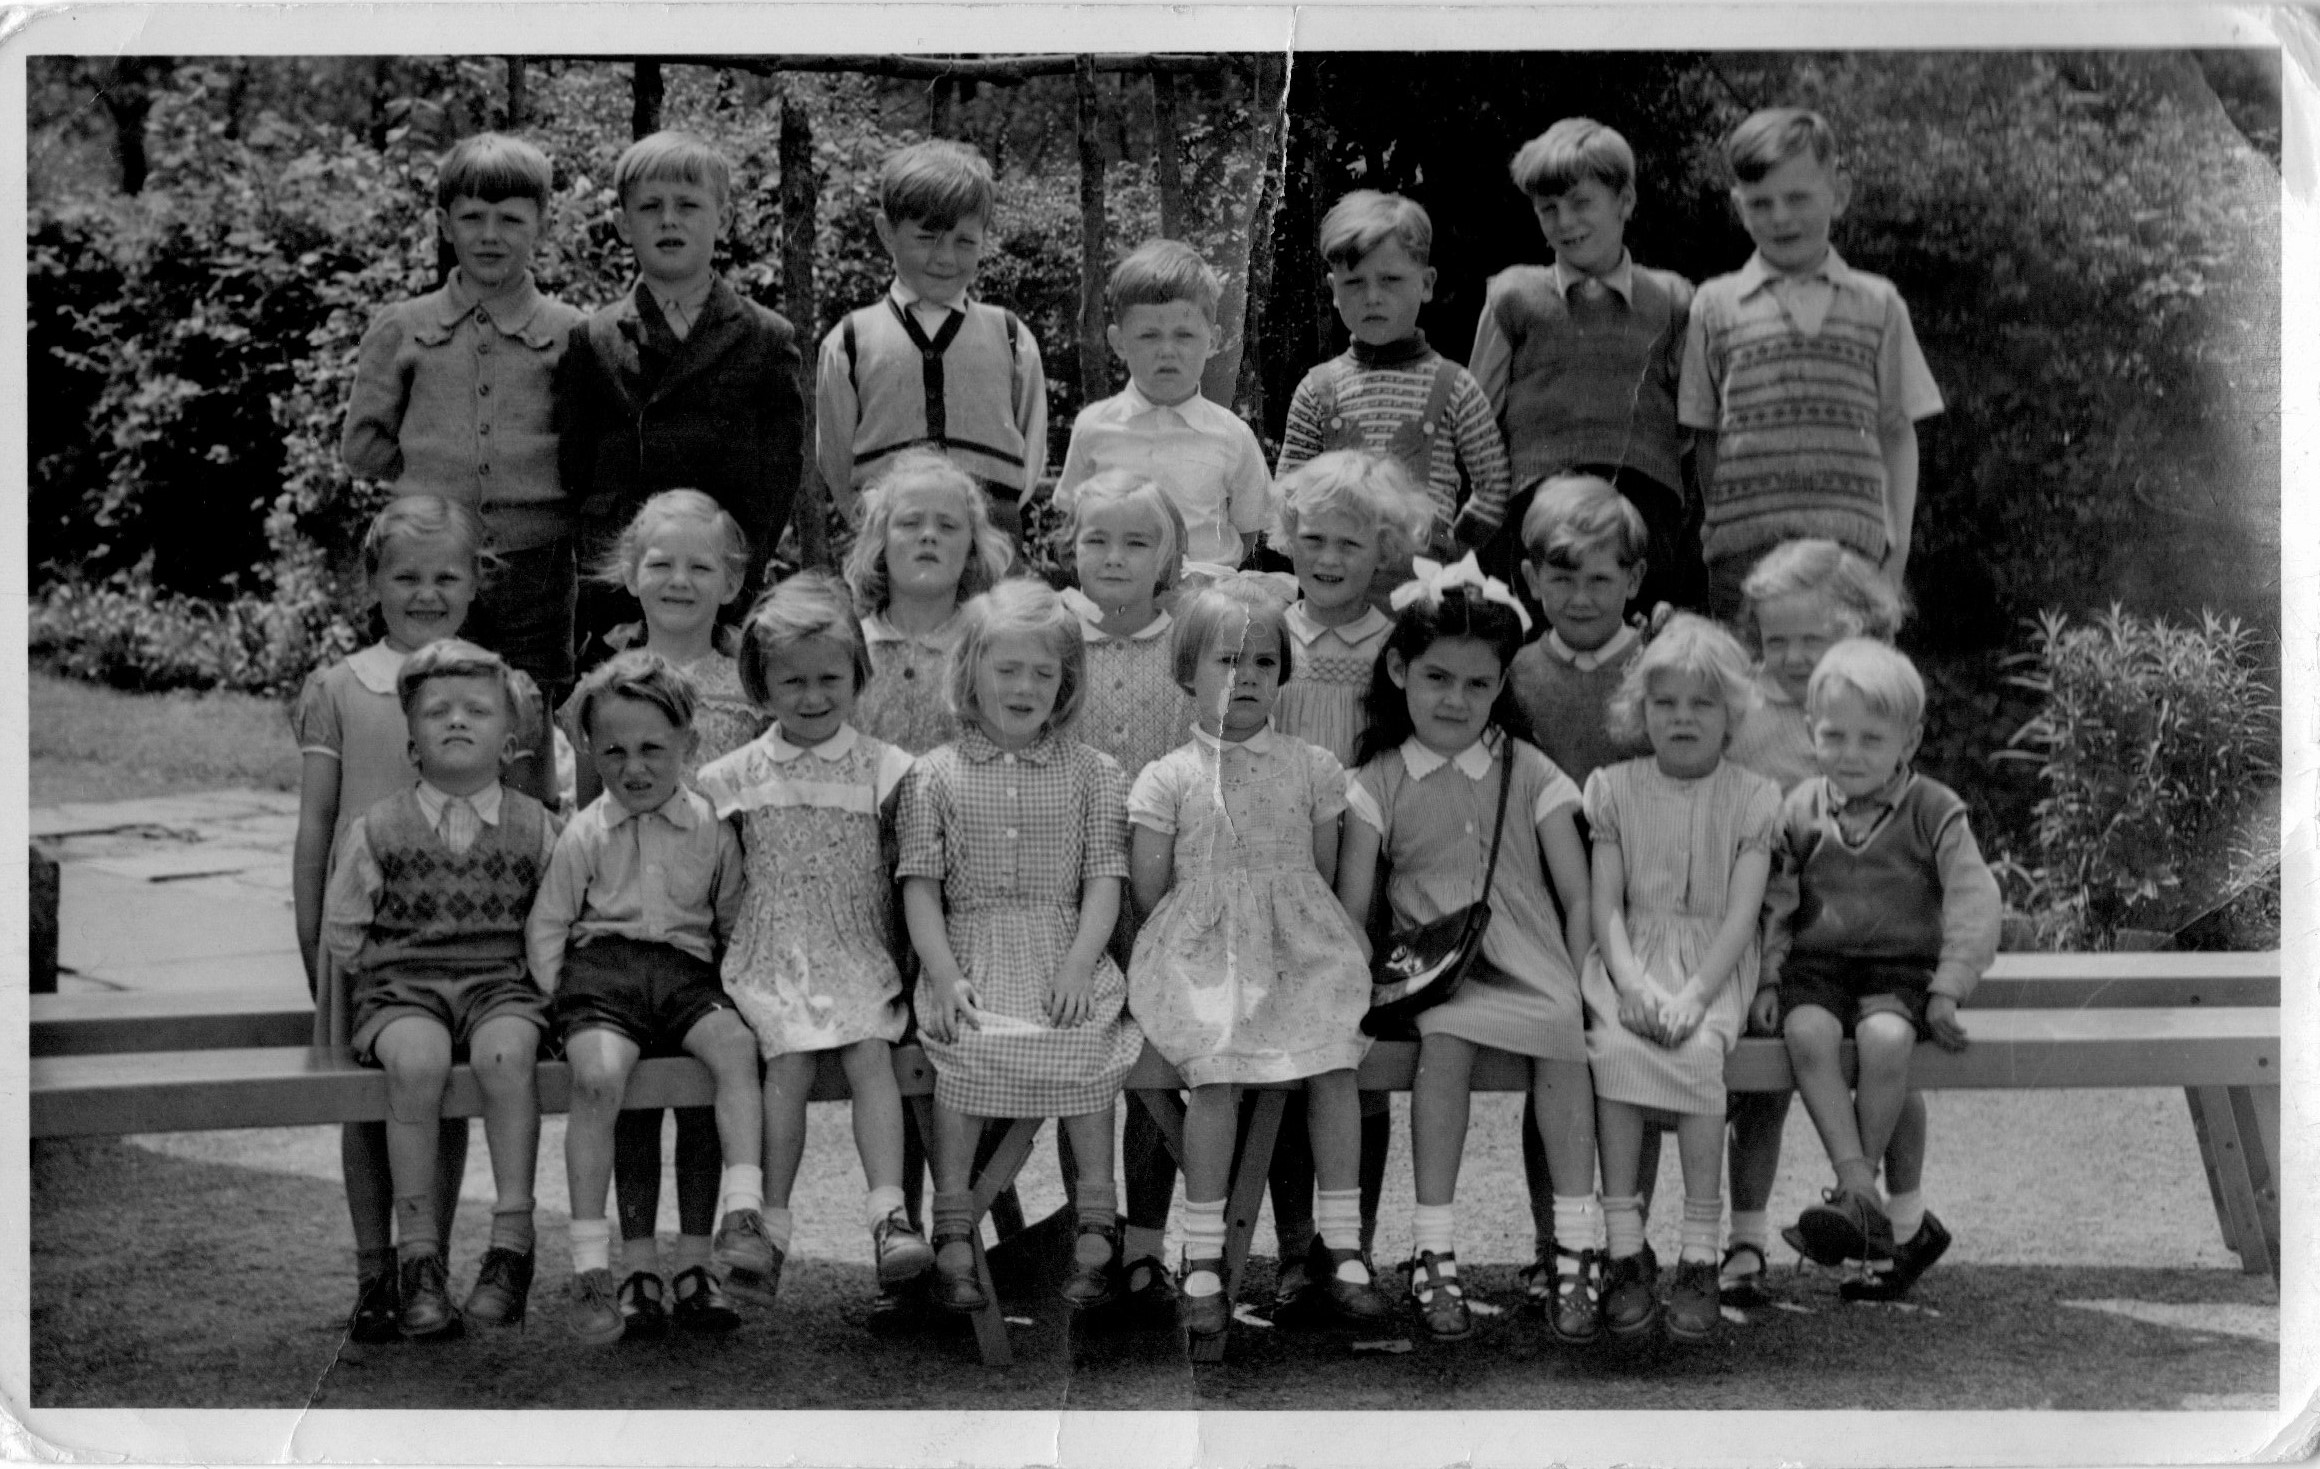 Talybont School 1950